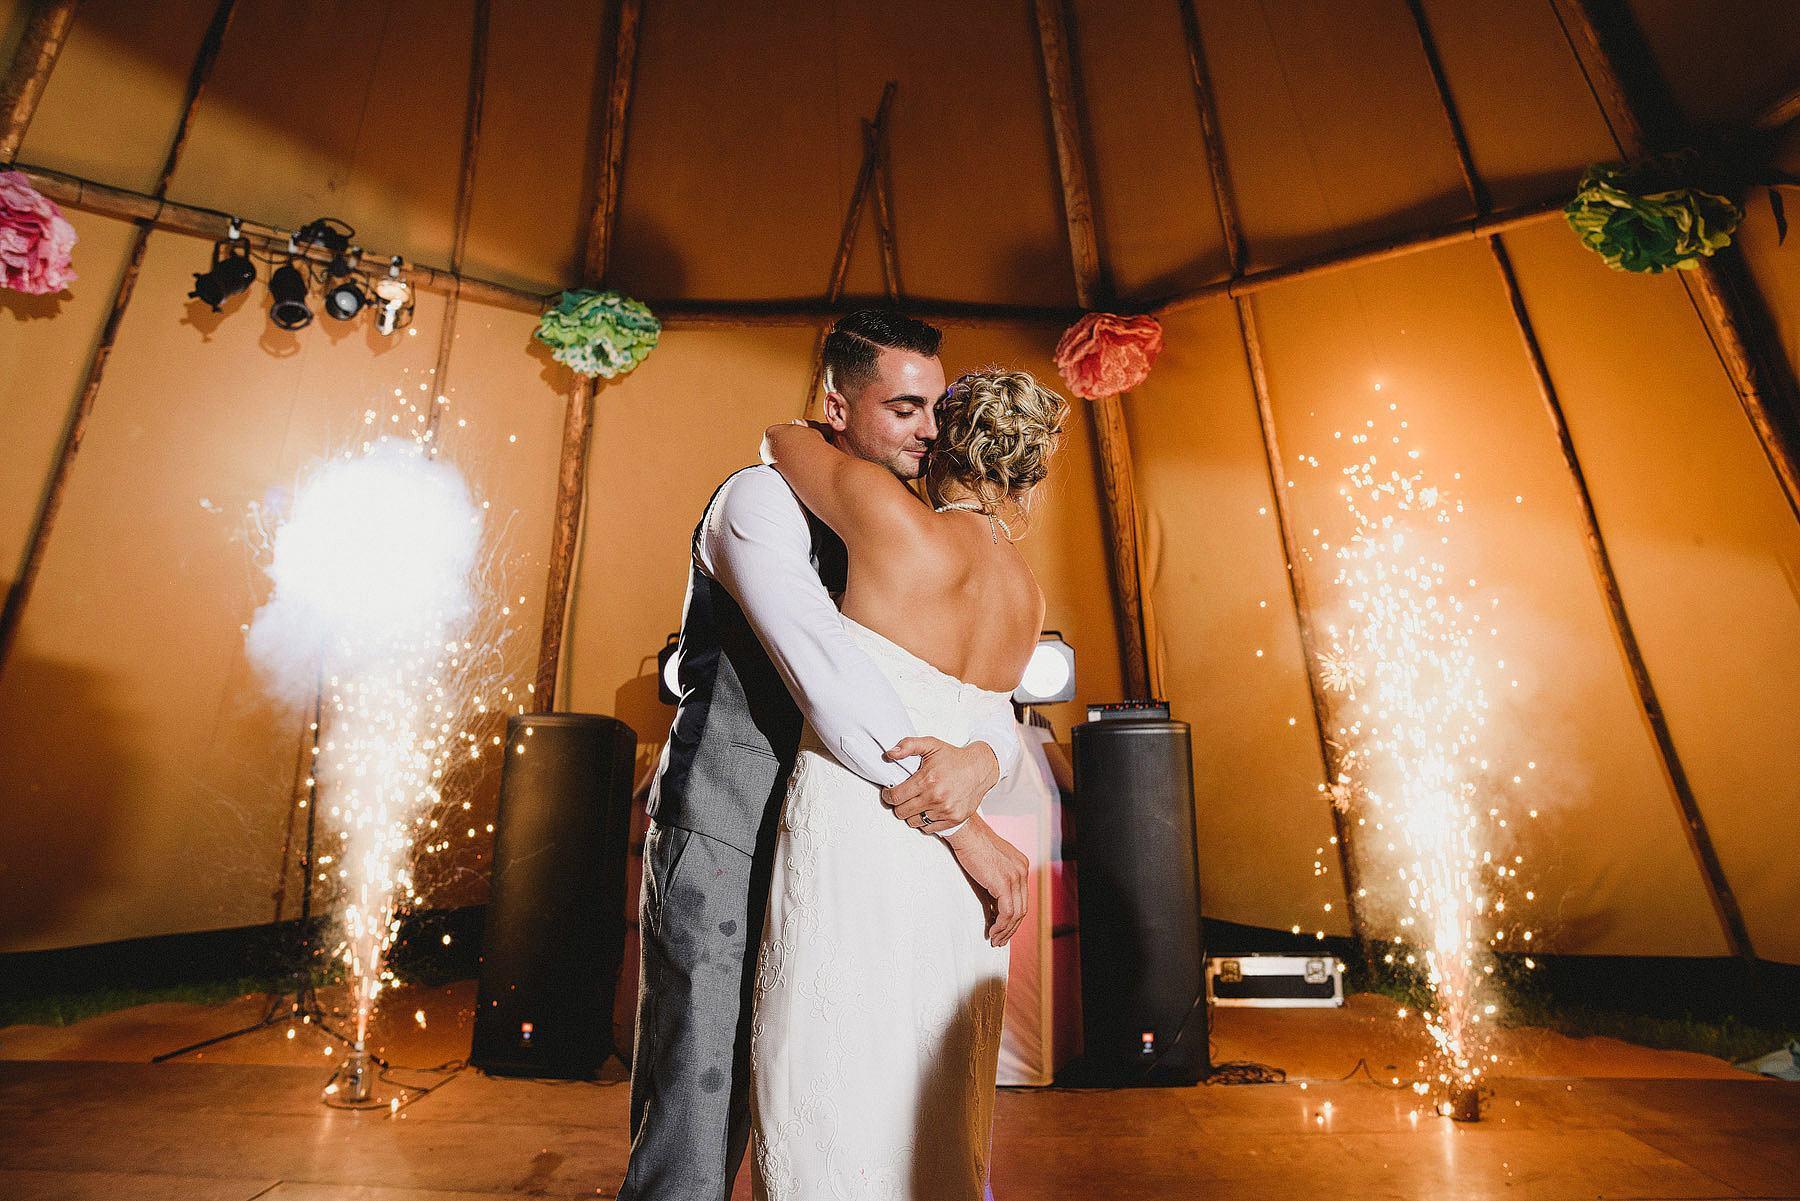 fireworks on dancefloor at a wedding